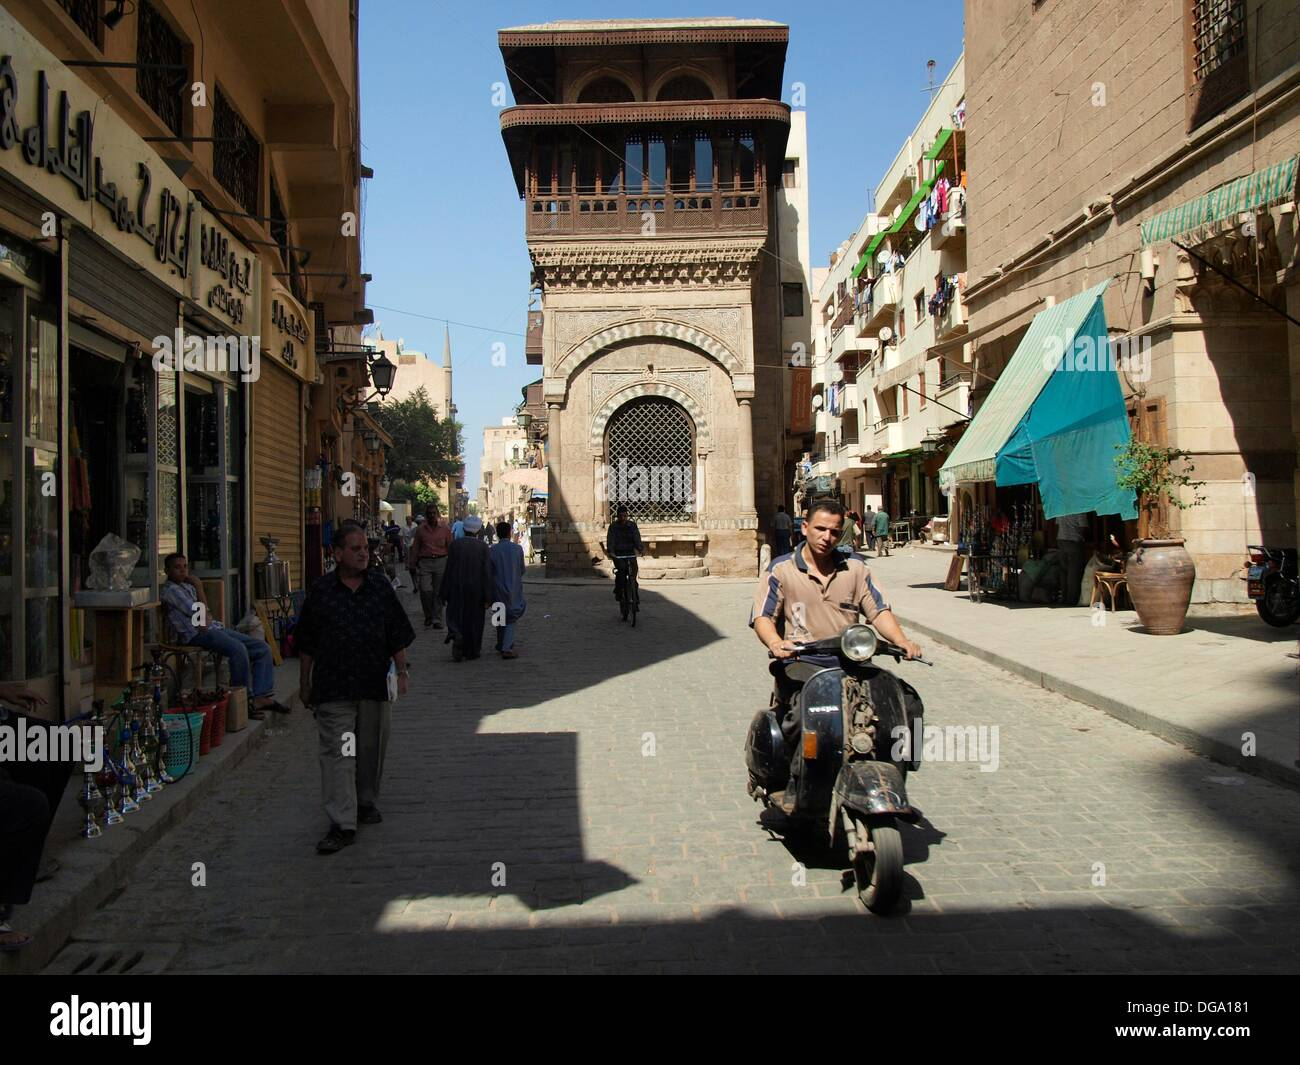 Calle histórica Al Muizz, El Cairo, Egipto - Stock Image